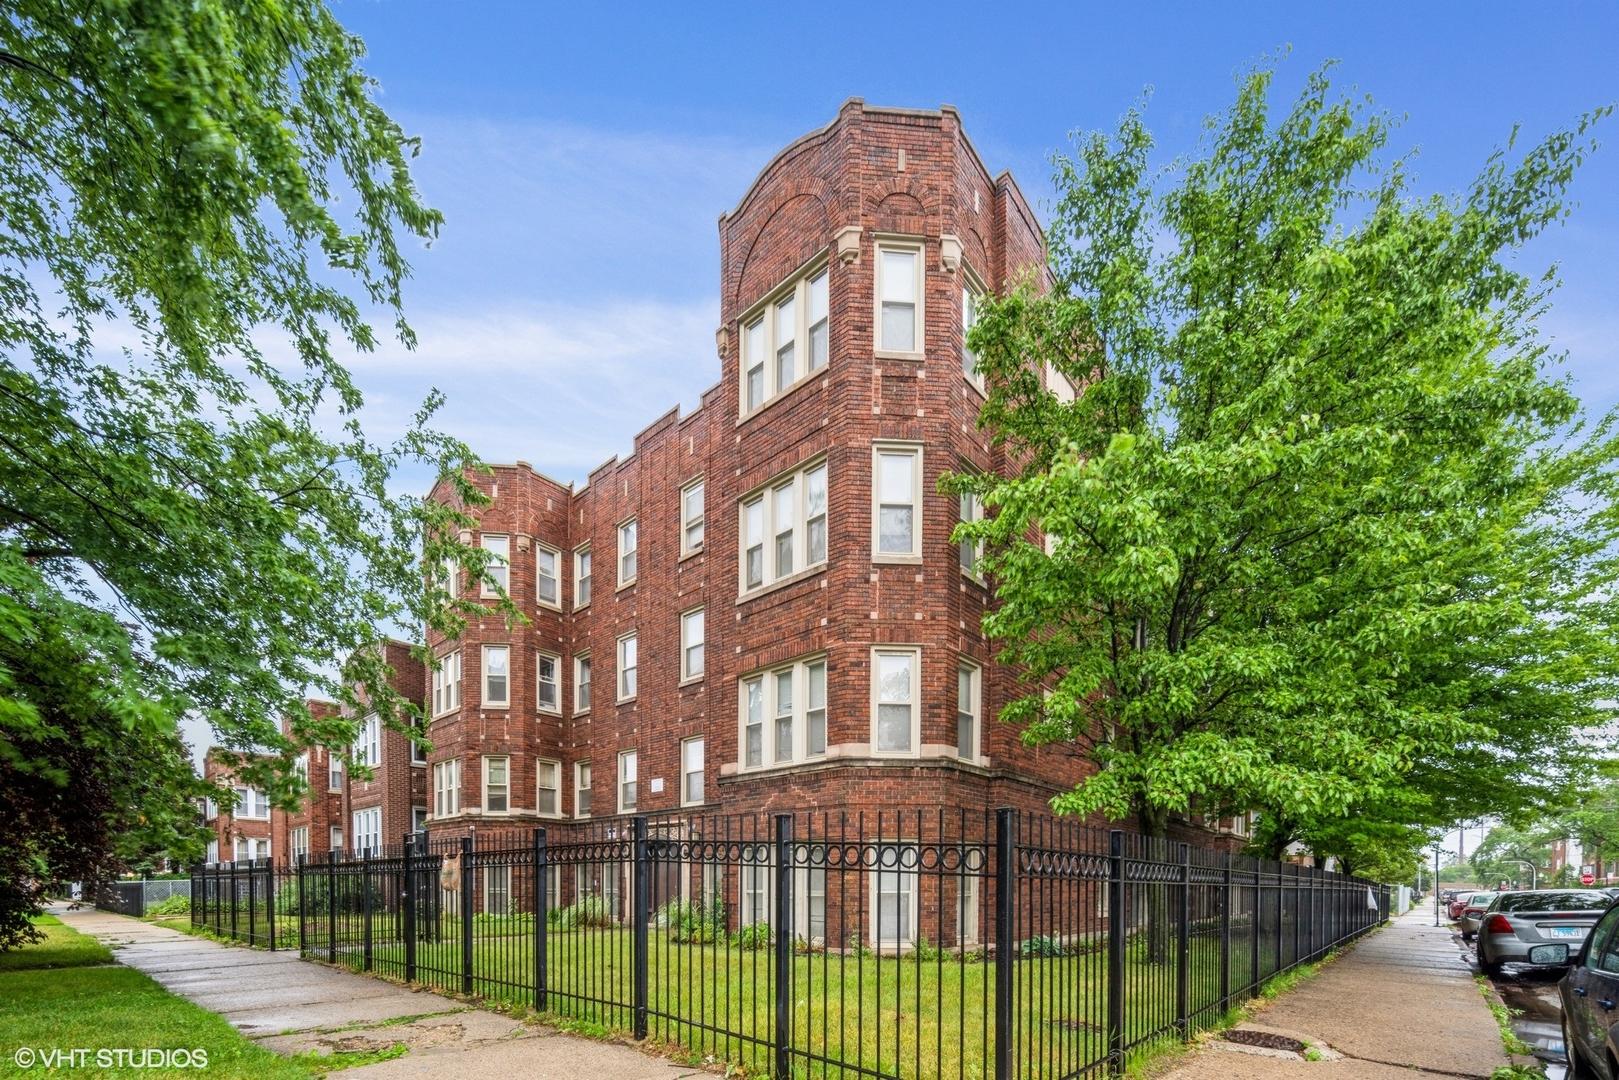 7800 S Ridgeland Avenue, Chicago, IL 60649